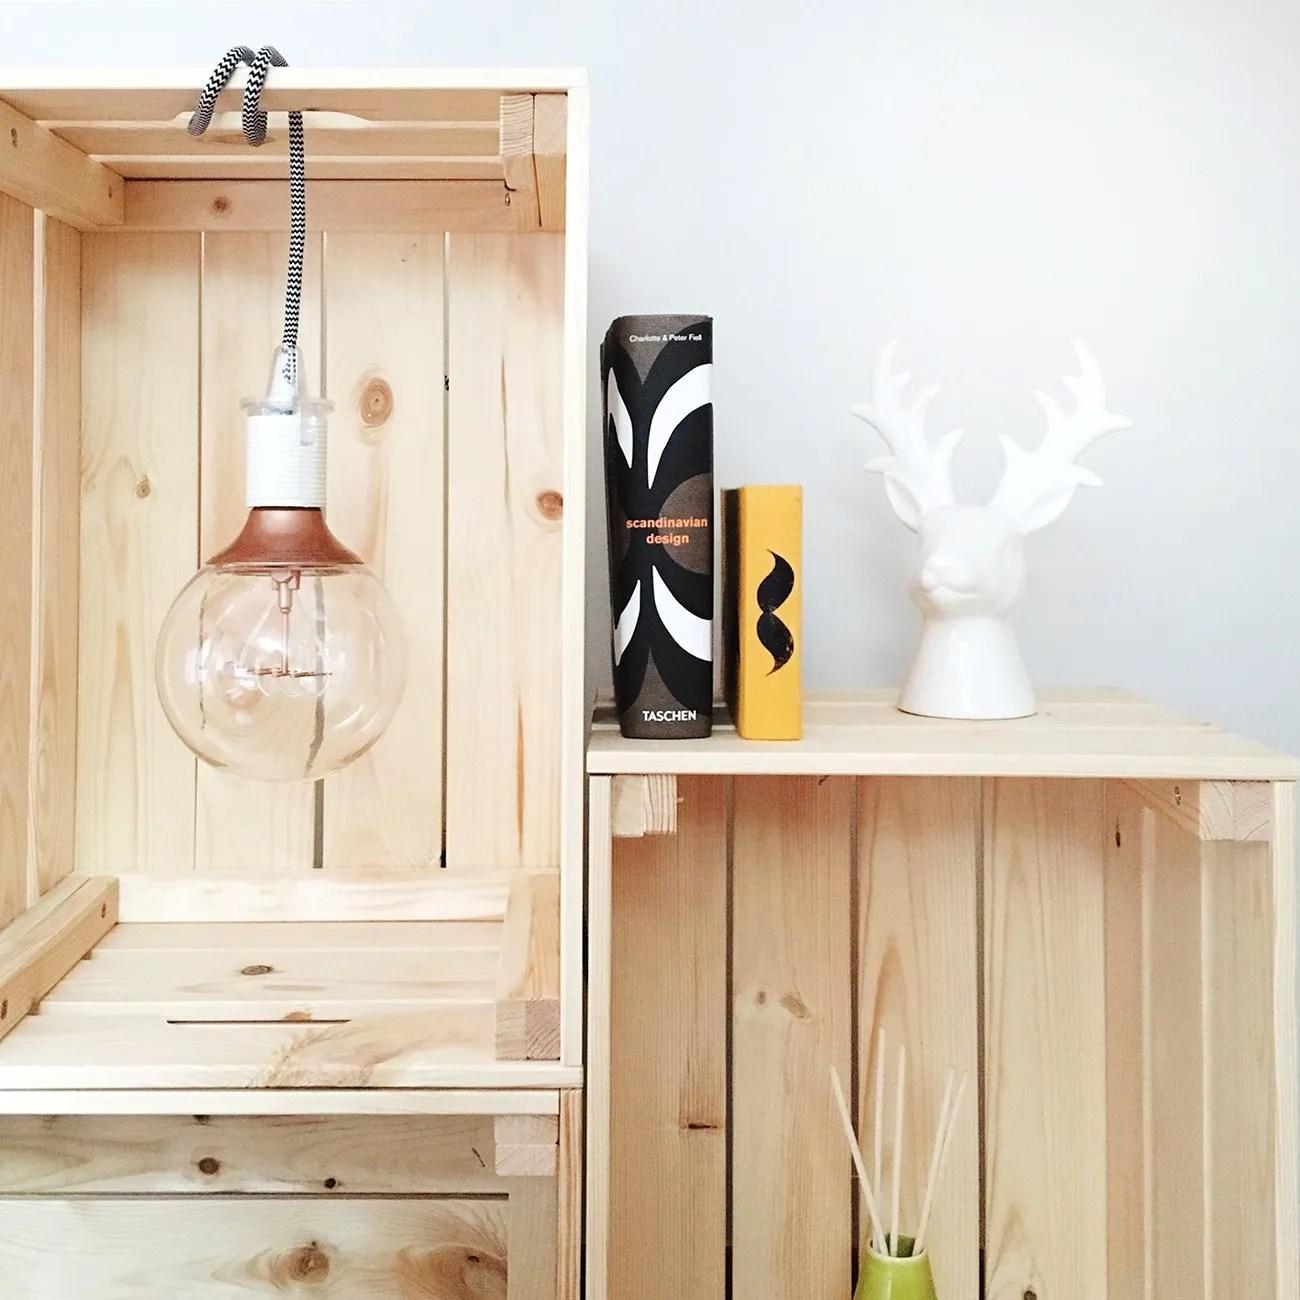 diy storage with hanging light bulb